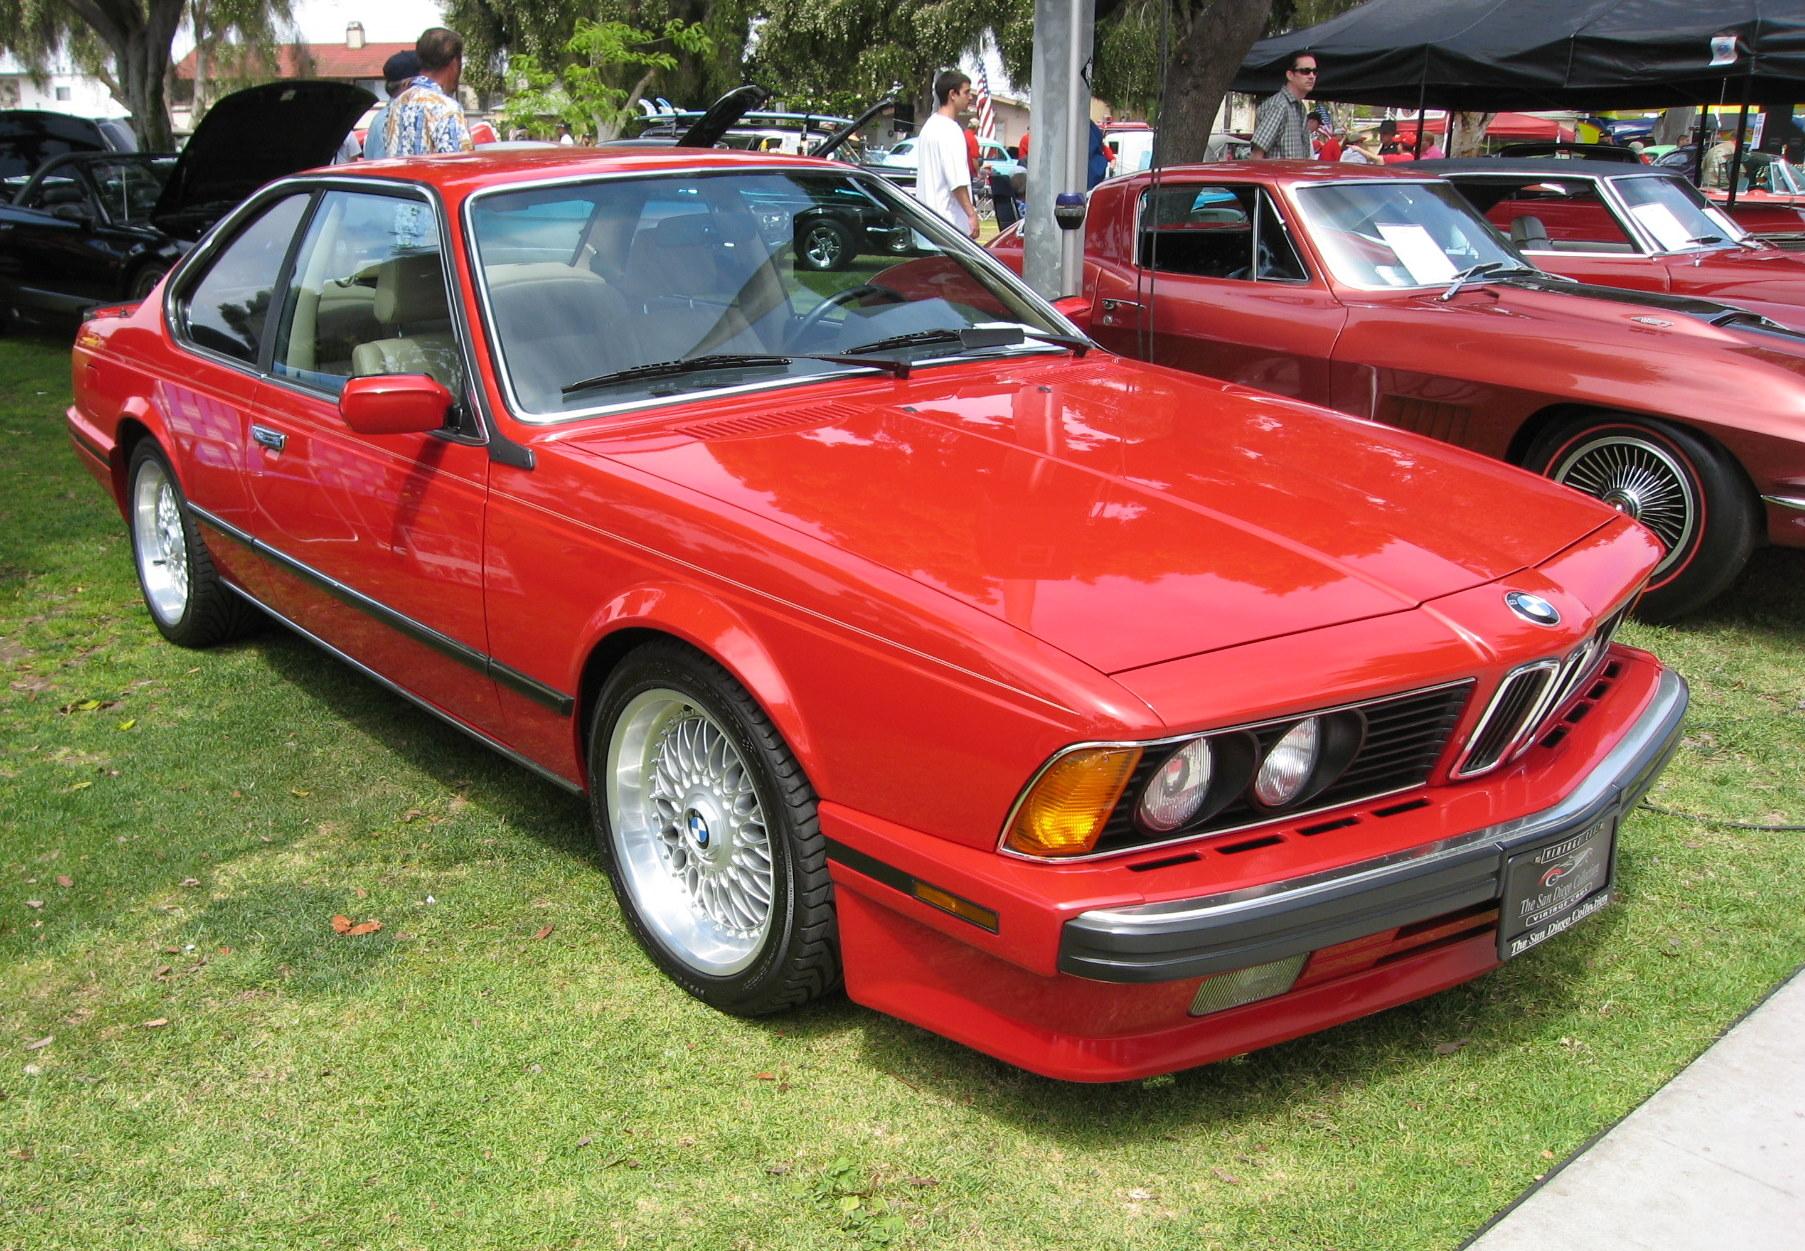 File:1986 BMW M6.jpg - Wikipedia, the free encyclopedia